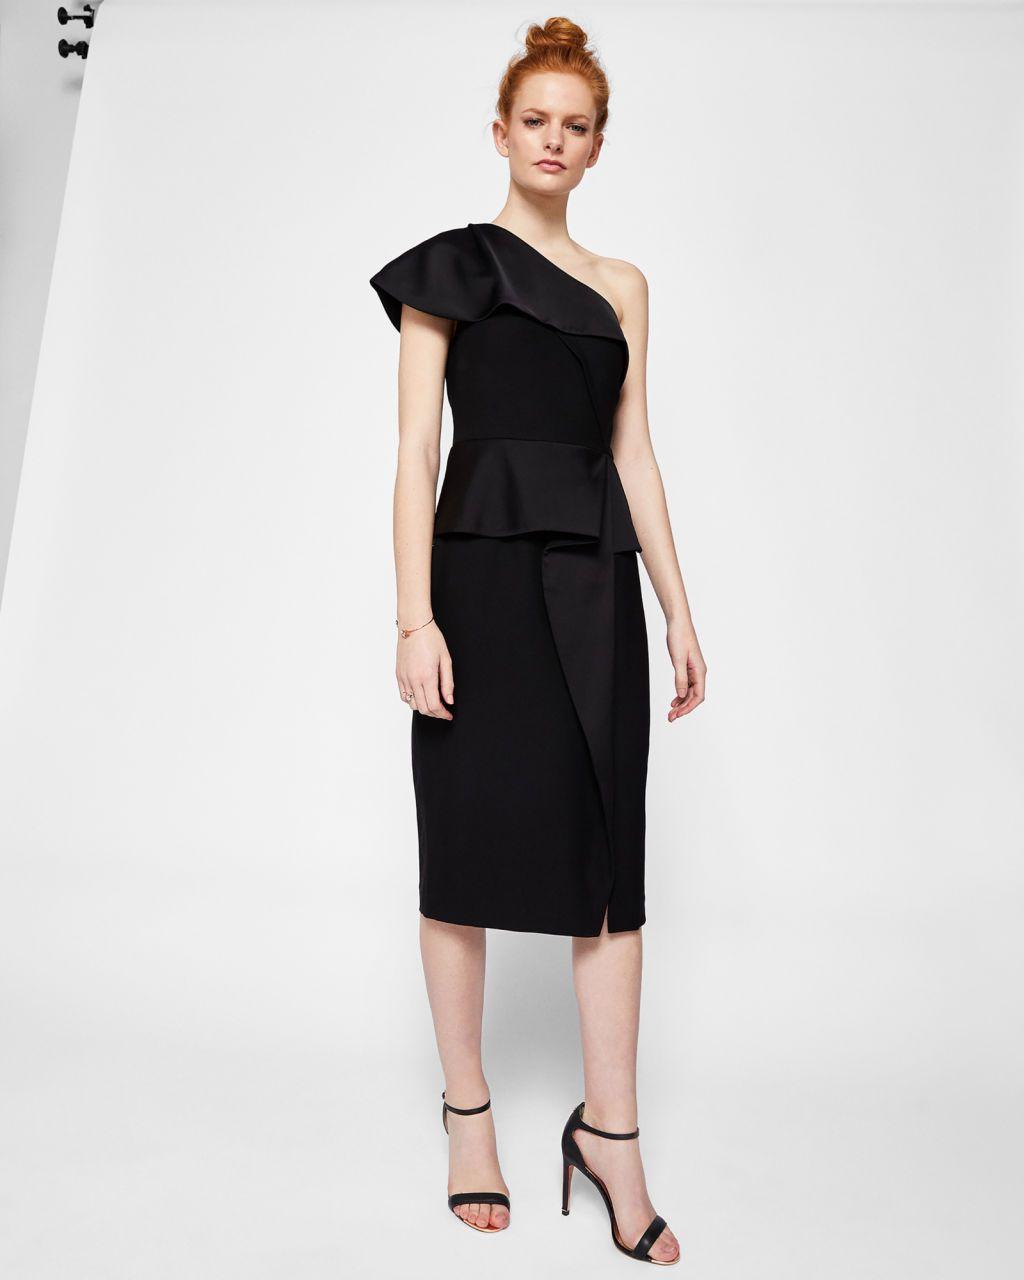 Wear black dress to spring wedding